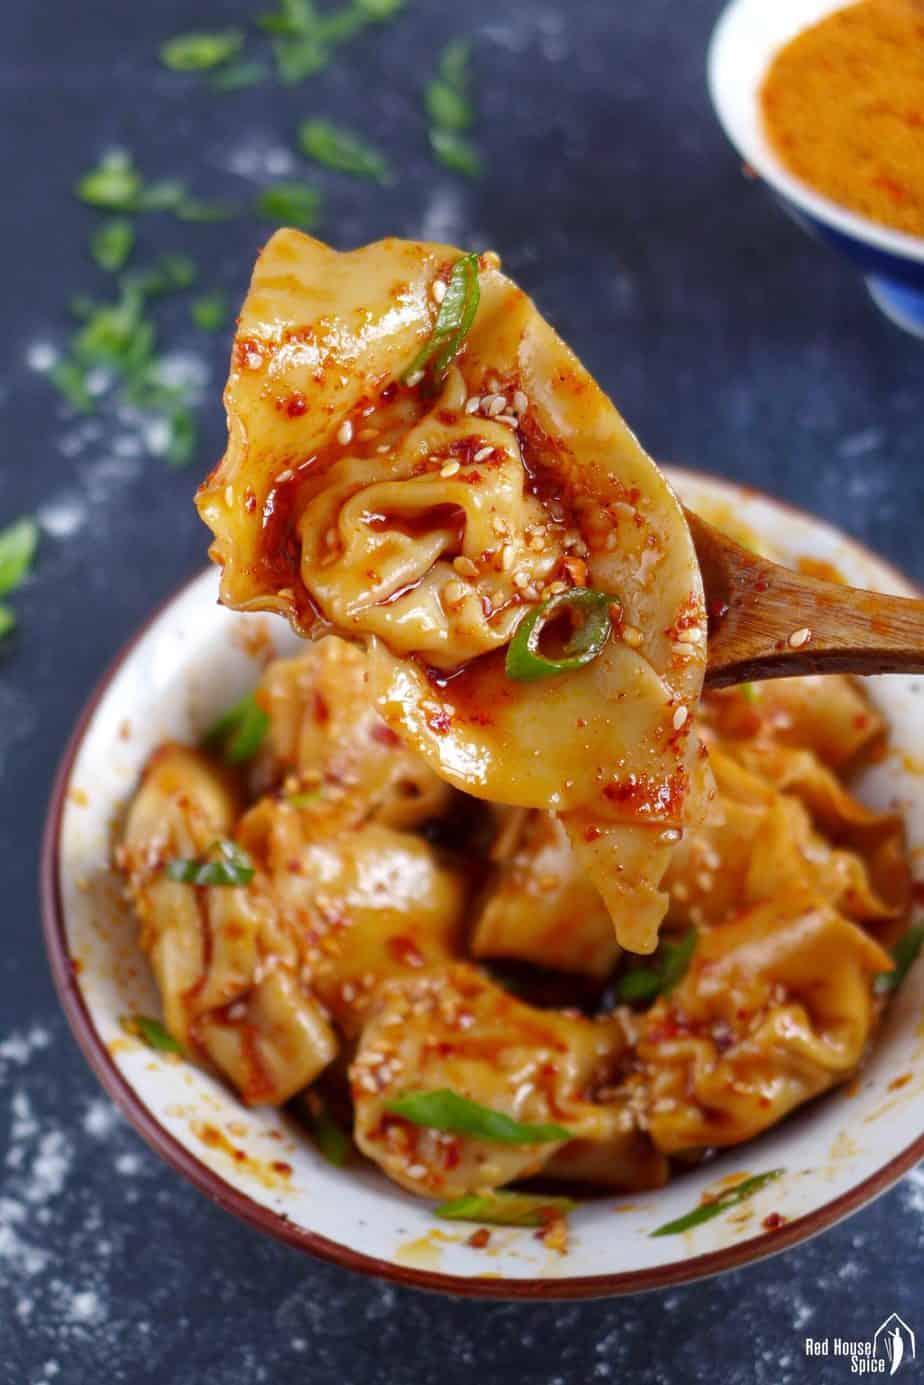 Sichuan spicy wonton in chili oil